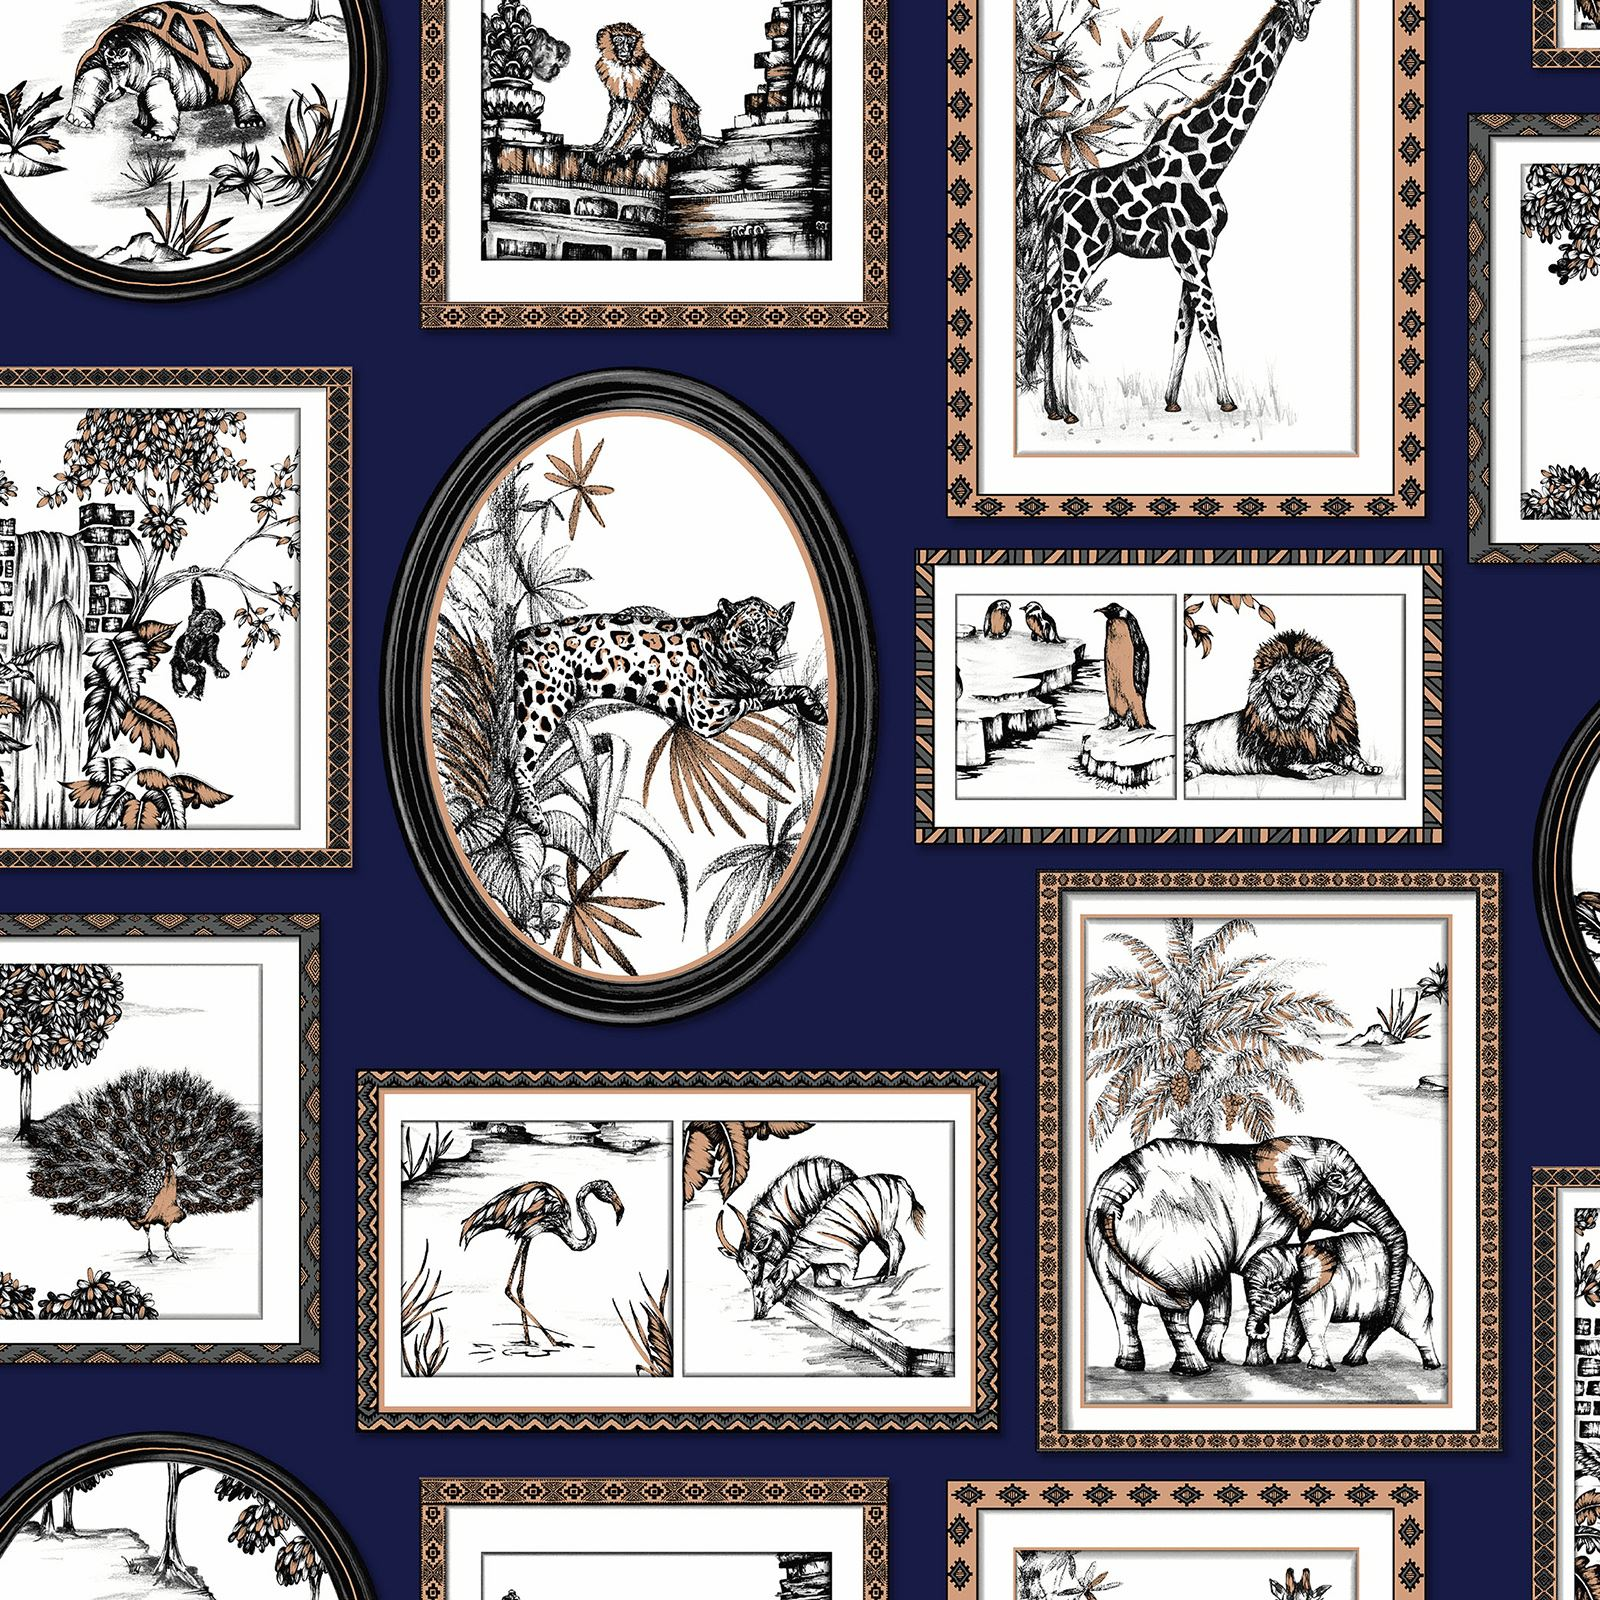 Safari Frames Wallpaper Navy / Copper - Holden 90072 | eBay